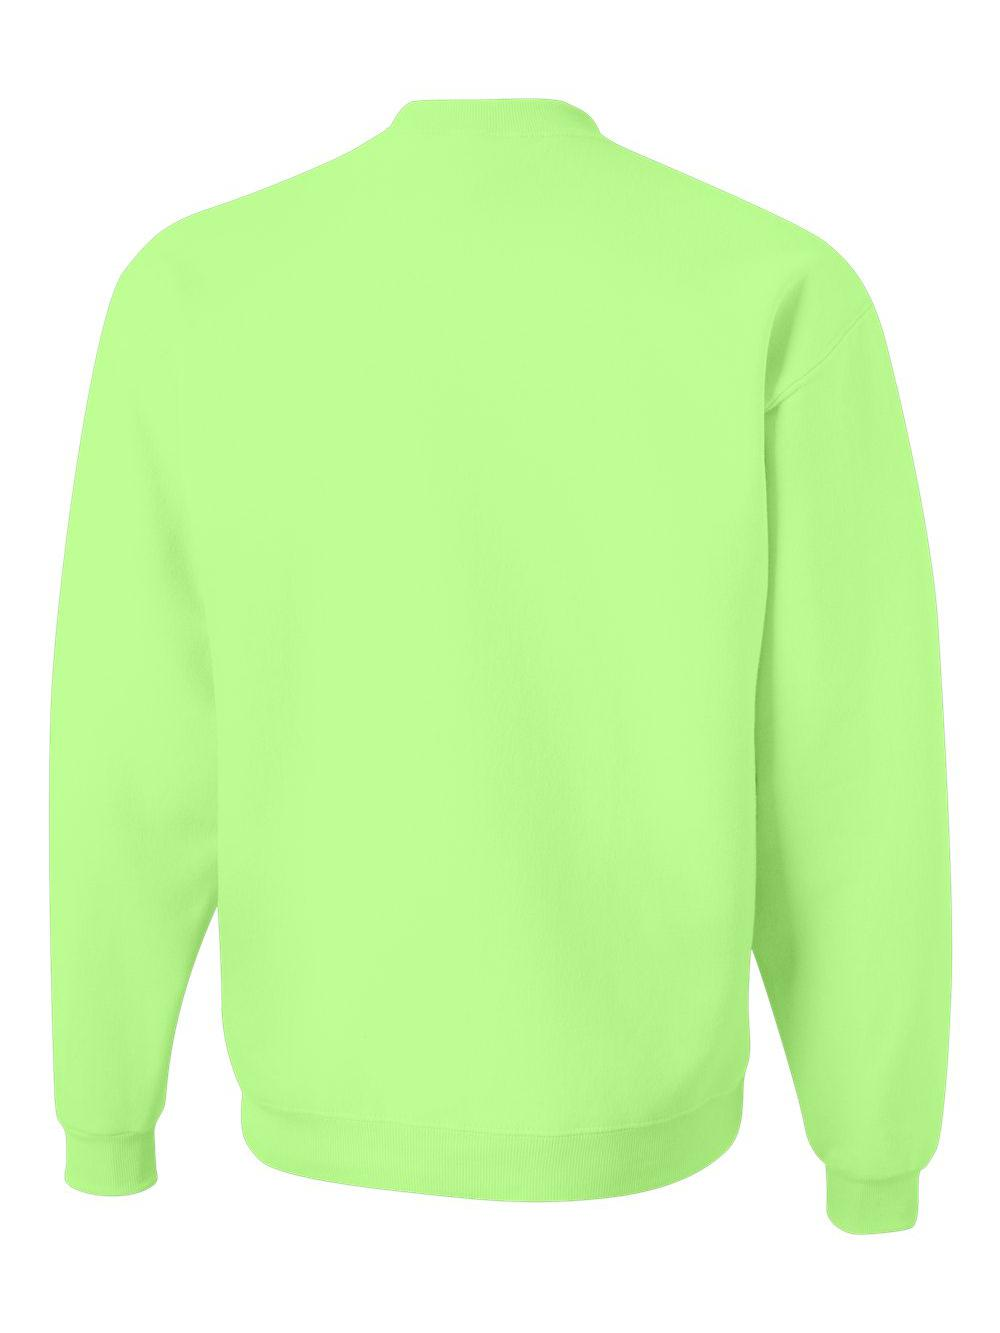 Jerzees-NuBlend-Crewneck-Sweatshirt-562MR thumbnail 61